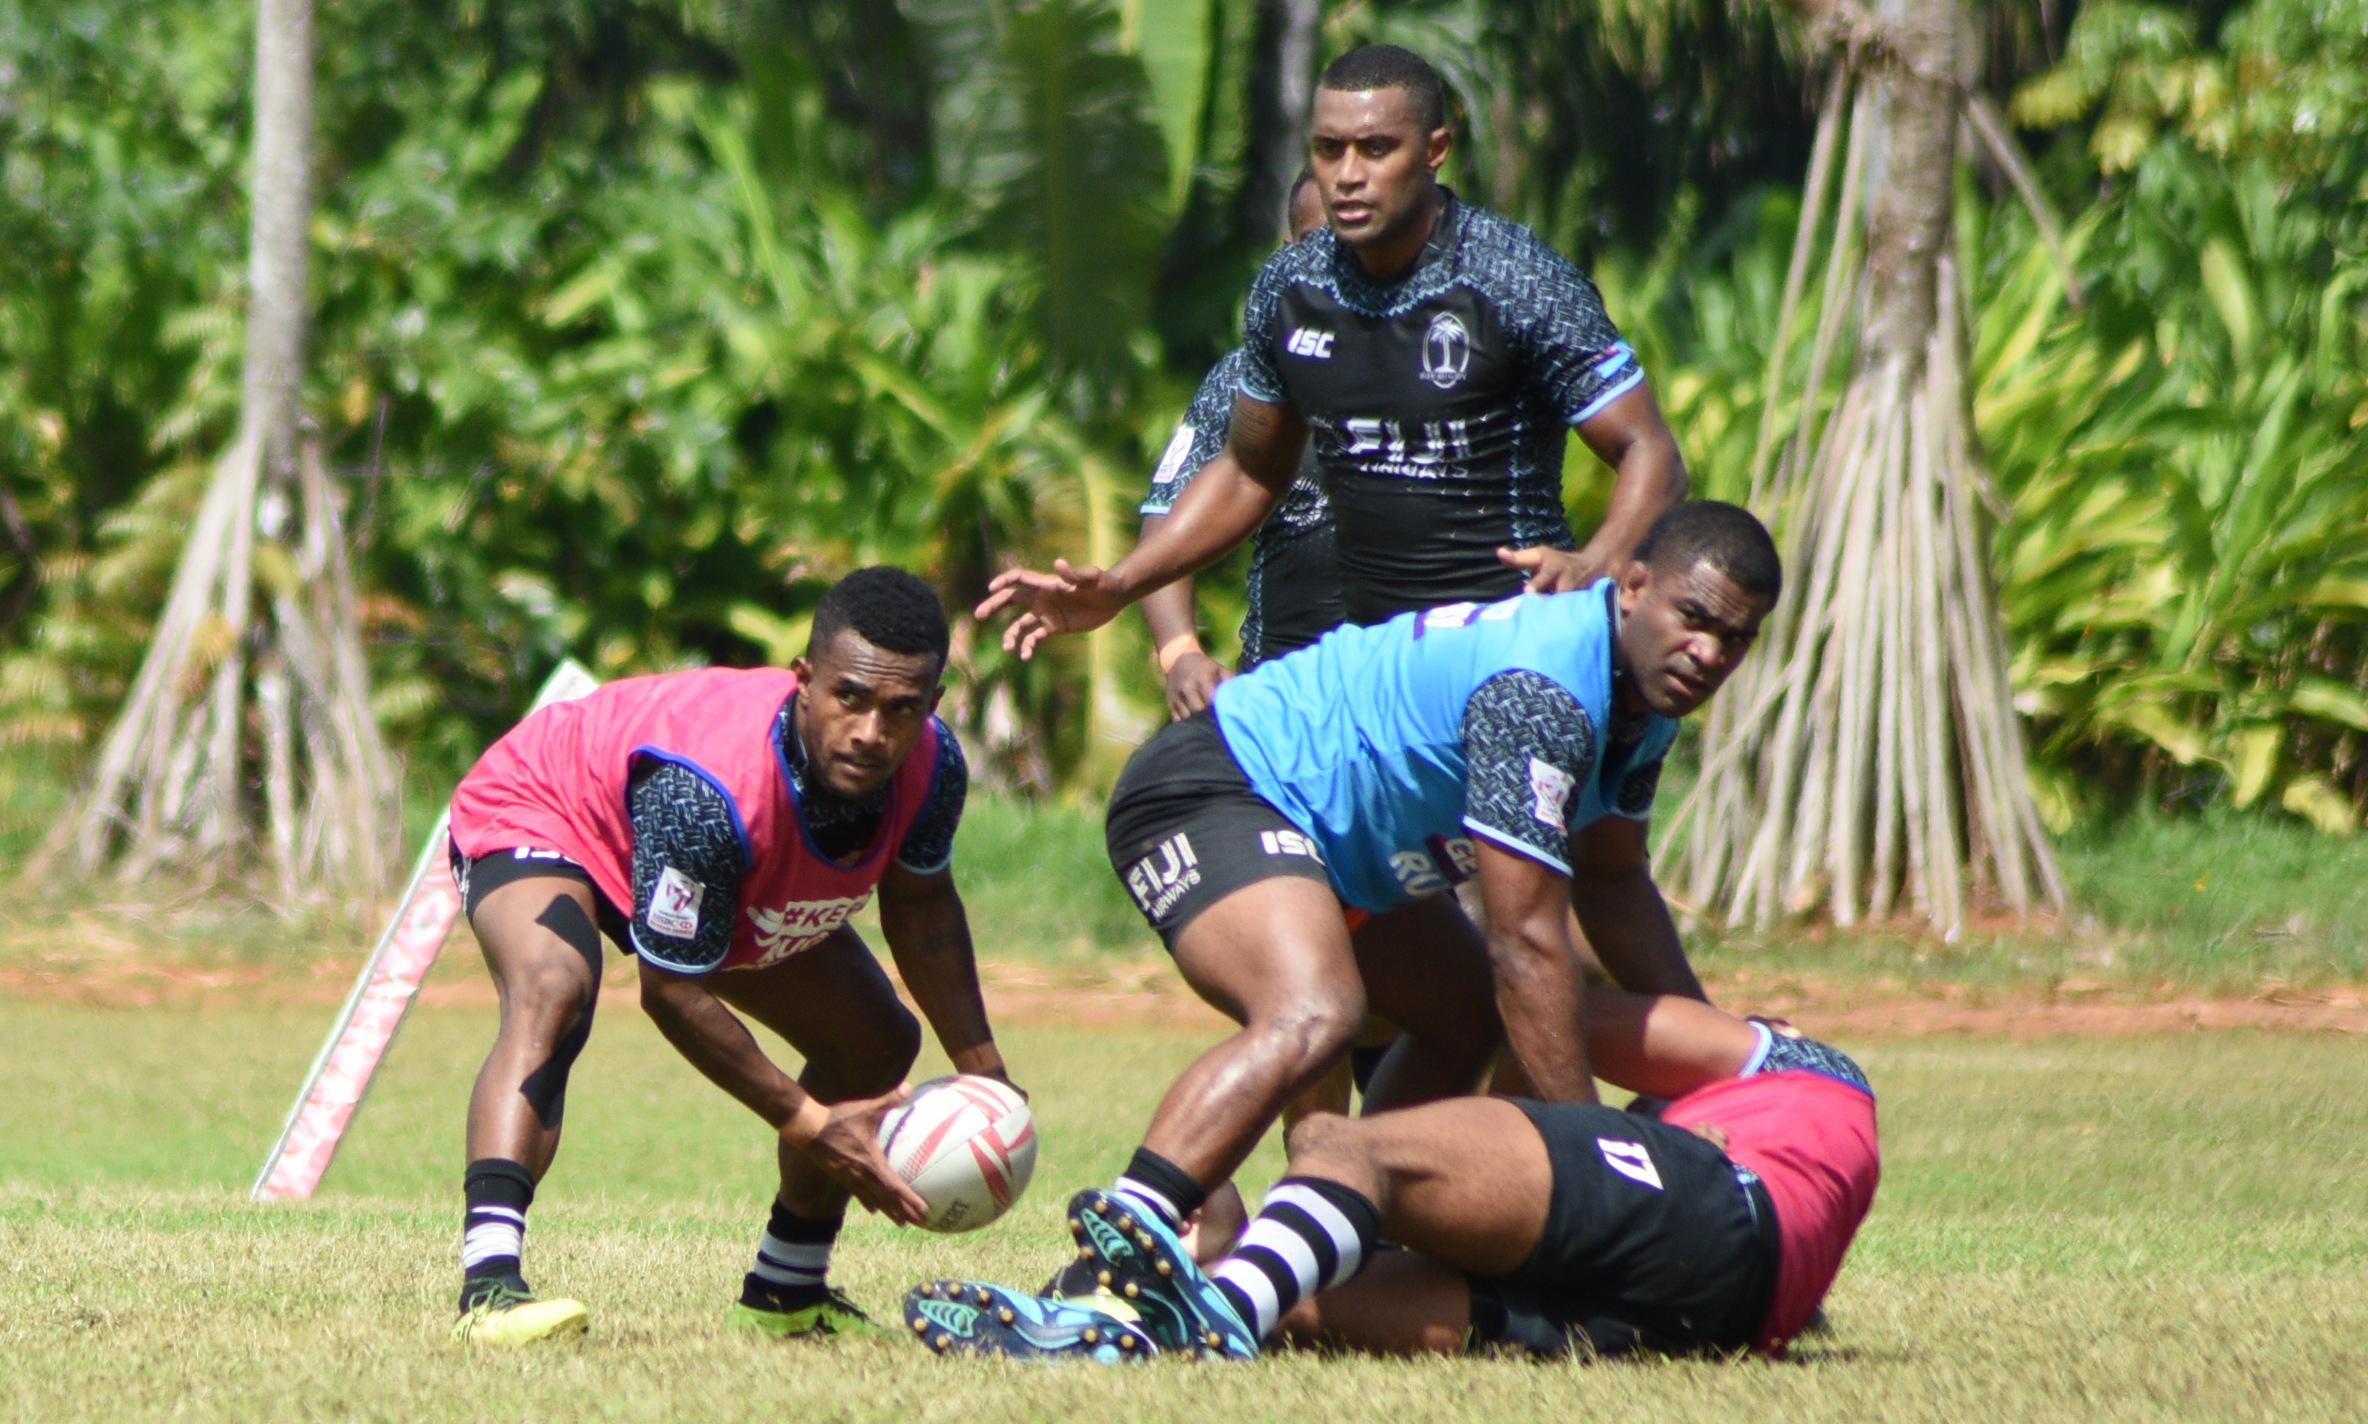 Fiji Airways Fijian 7s squad  during training at Uprising Resort ground on May 10, 2018. Photo: Ronald Kumar